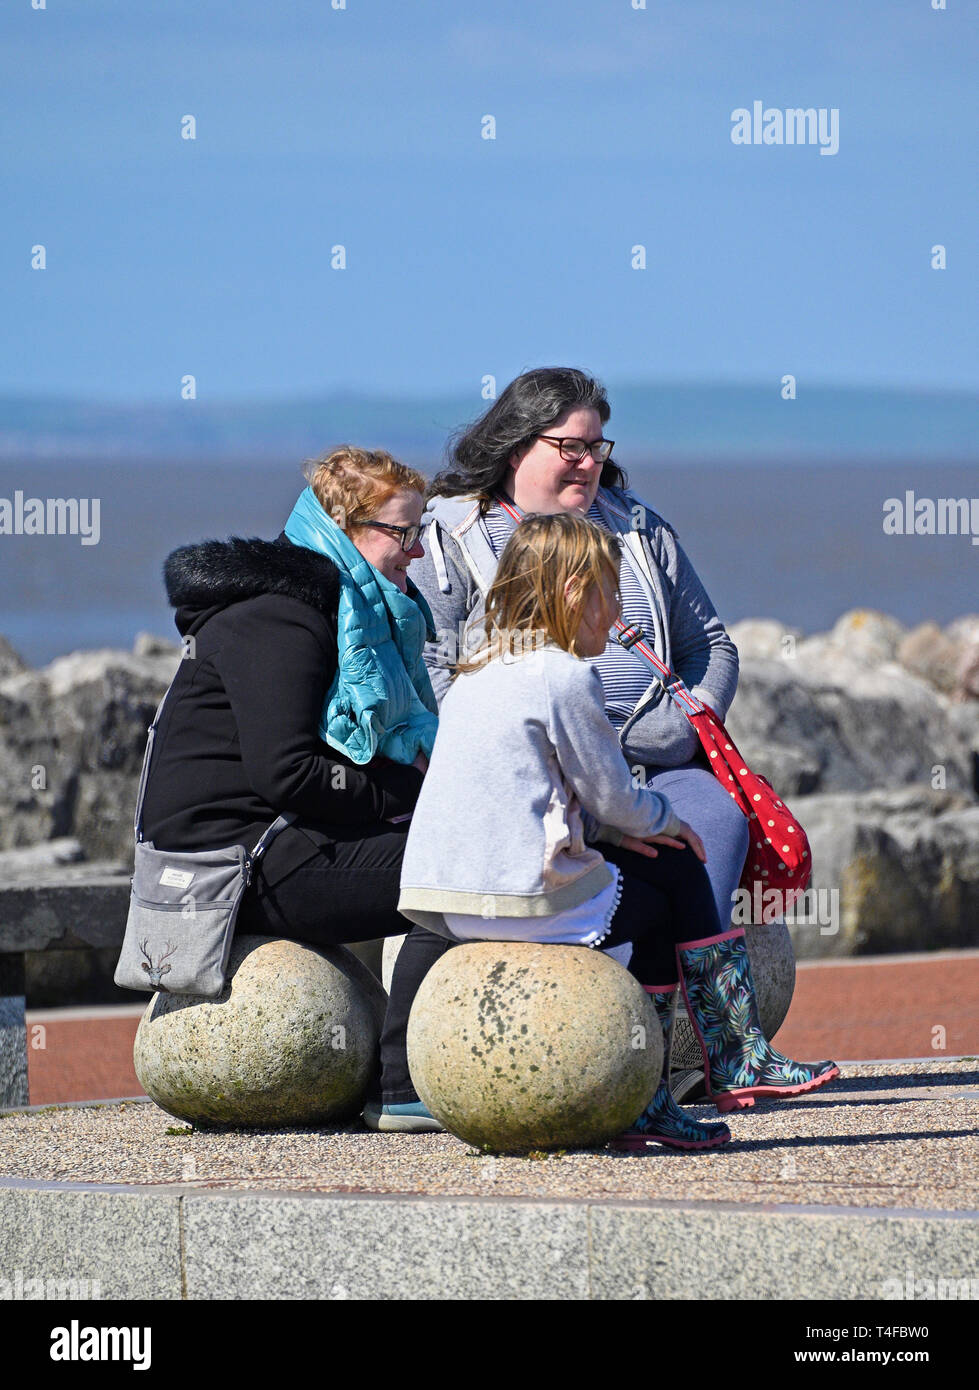 Three females sitting on stone seats, in Spring sunshine. Stone Jetty, Promenade, Morecambe, Lancashire, England, United Kingdom, Europe. Stock Photo